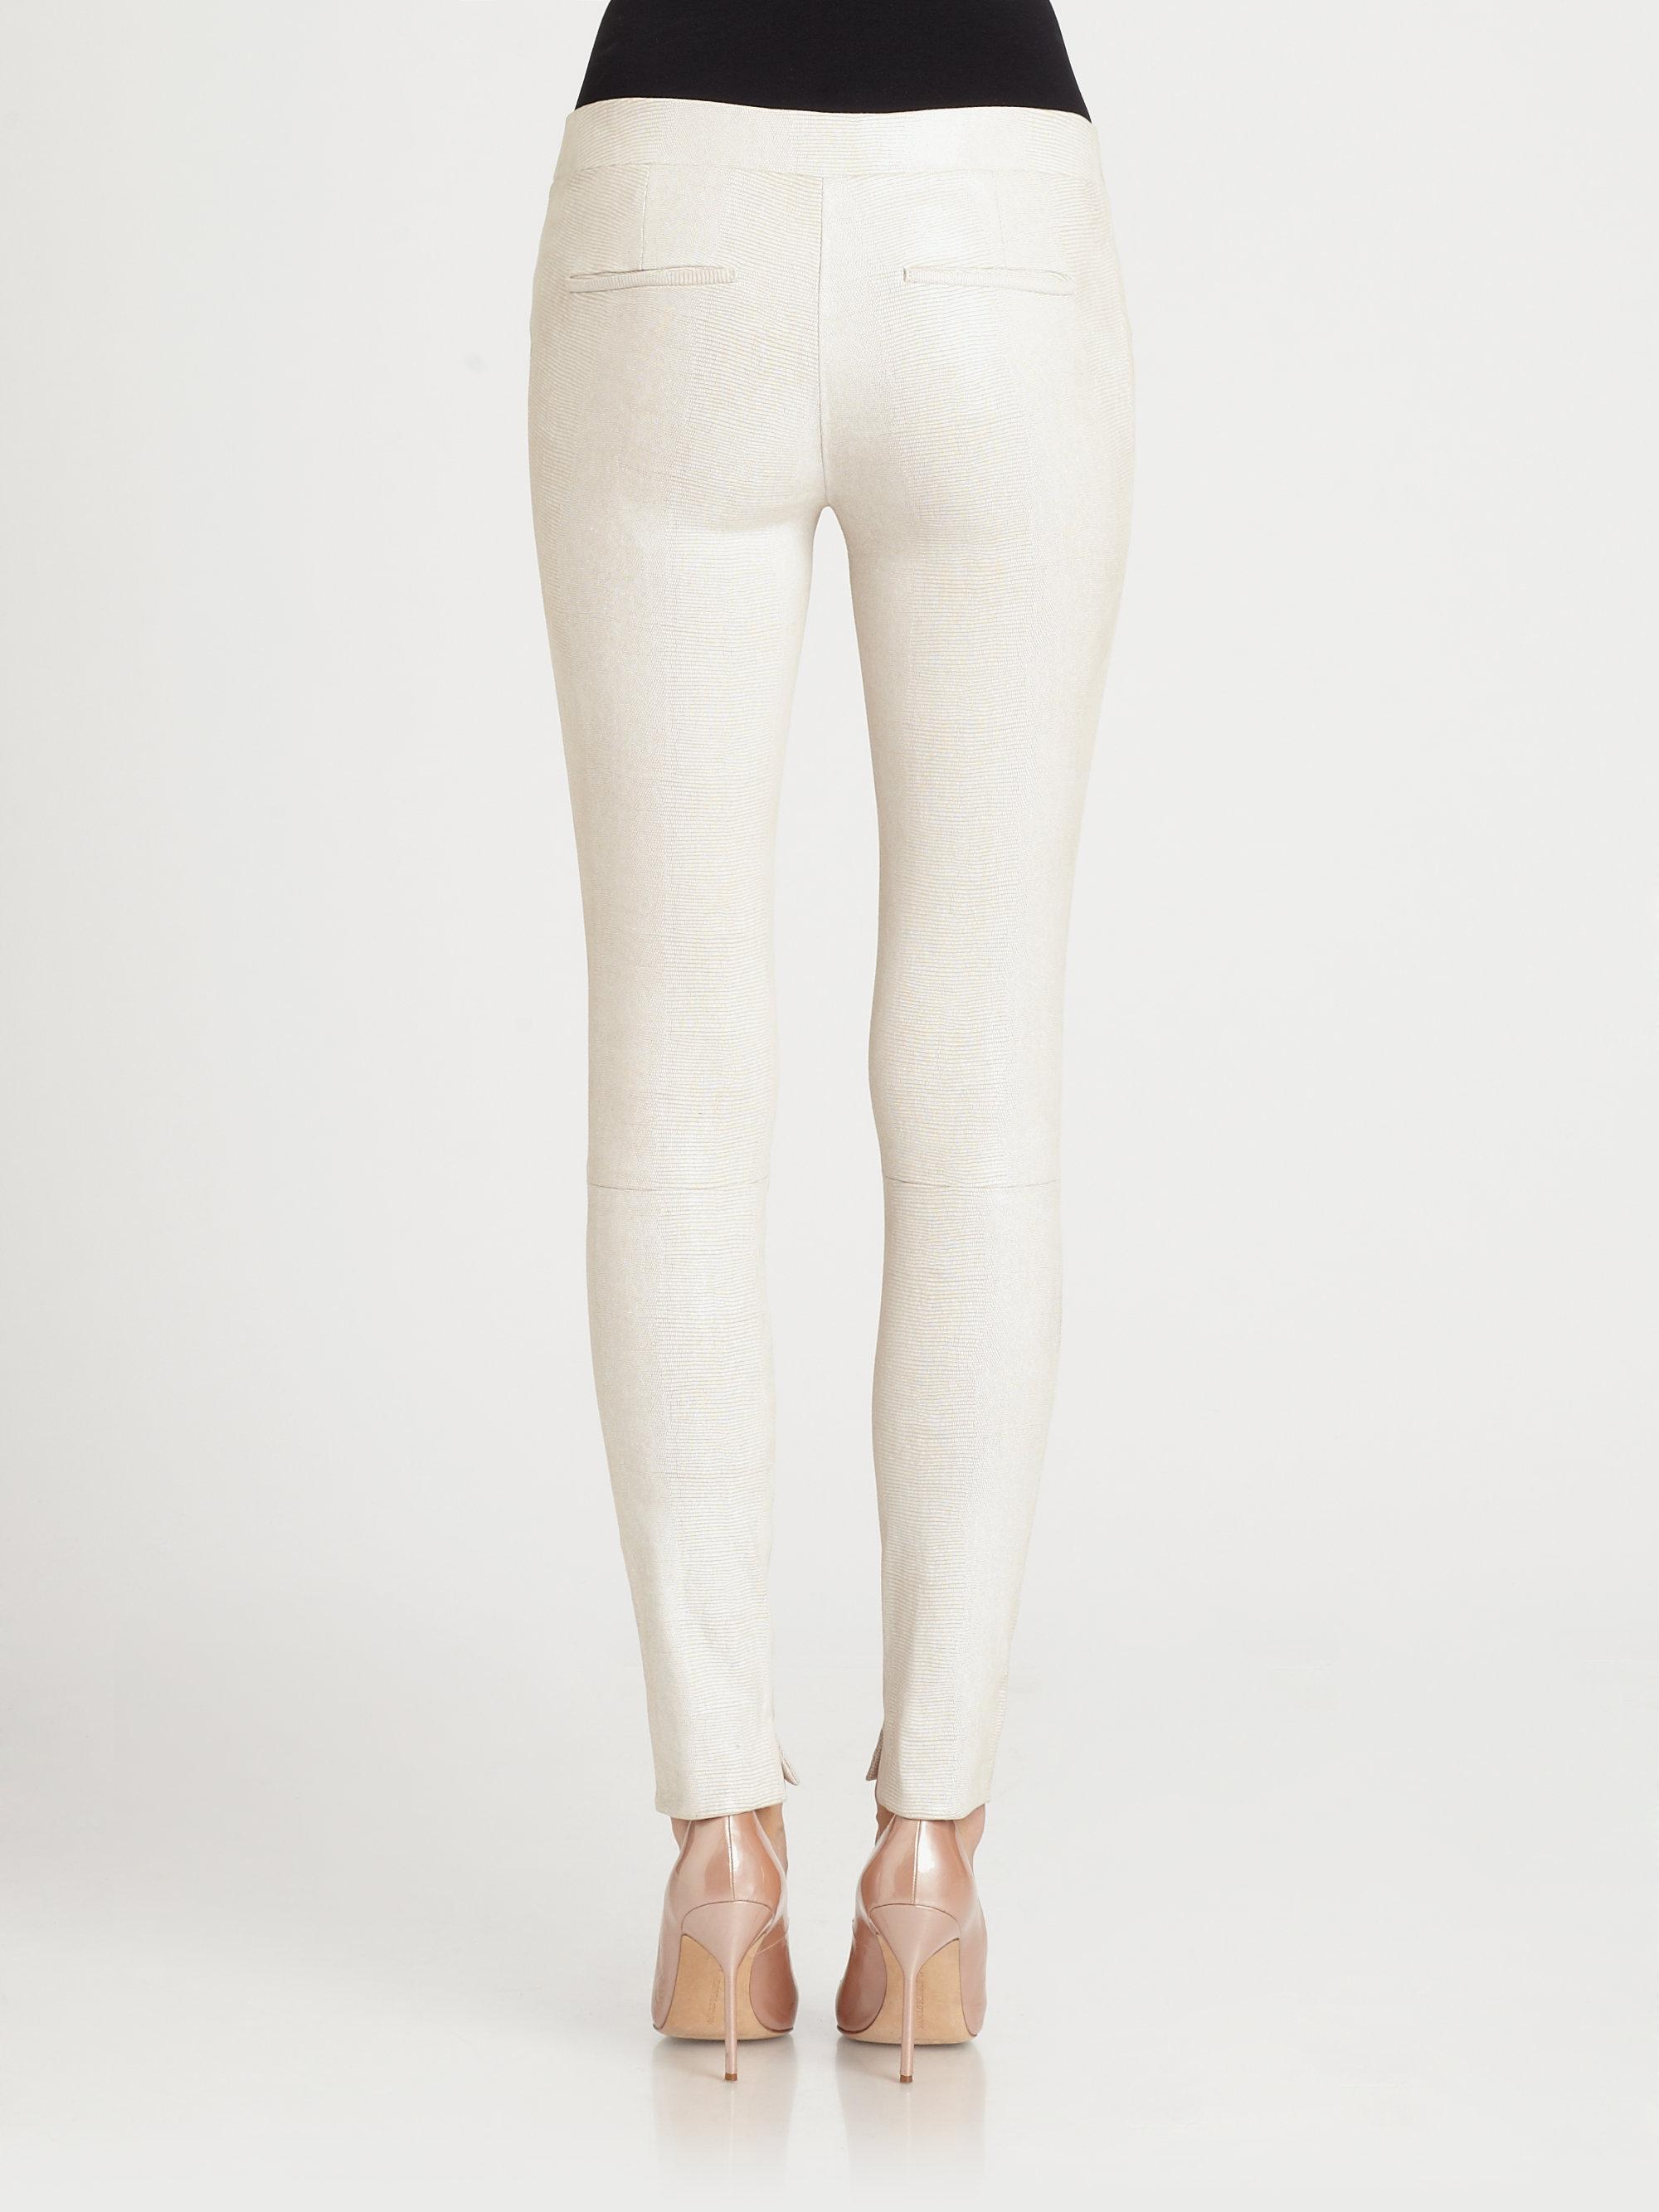 Mens Elastic Waist Jeans Pants